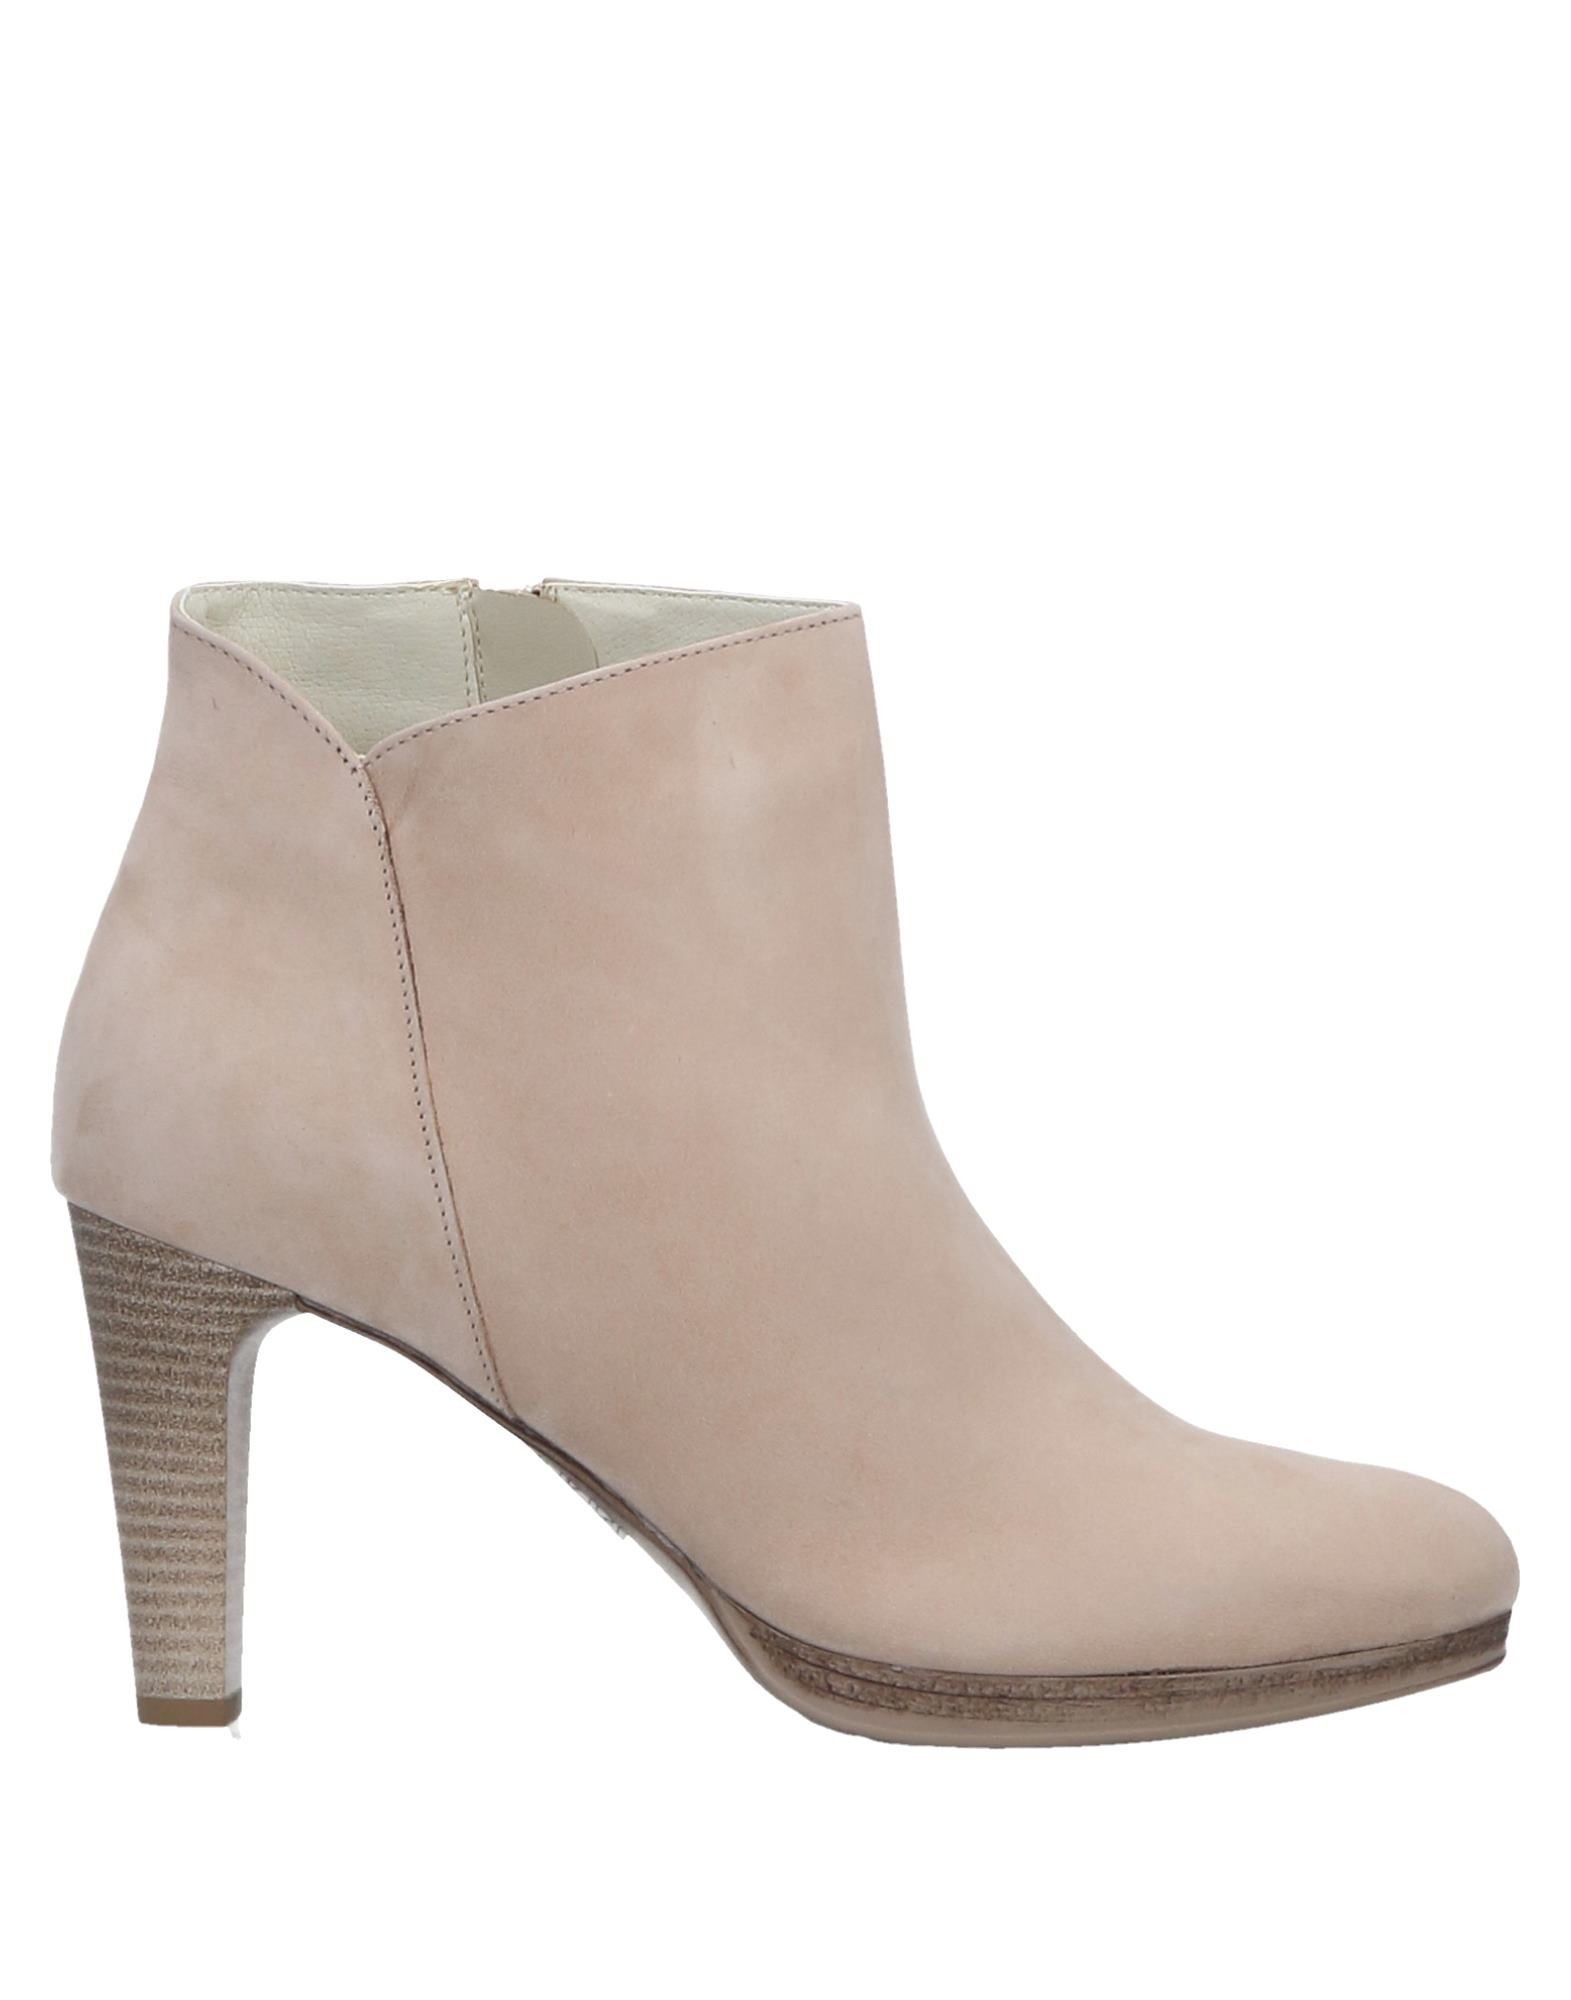 Eye Eye Ankle Boot - Women Eye Eye Ankle Boots online on  Canada - 11284807PH b141e8